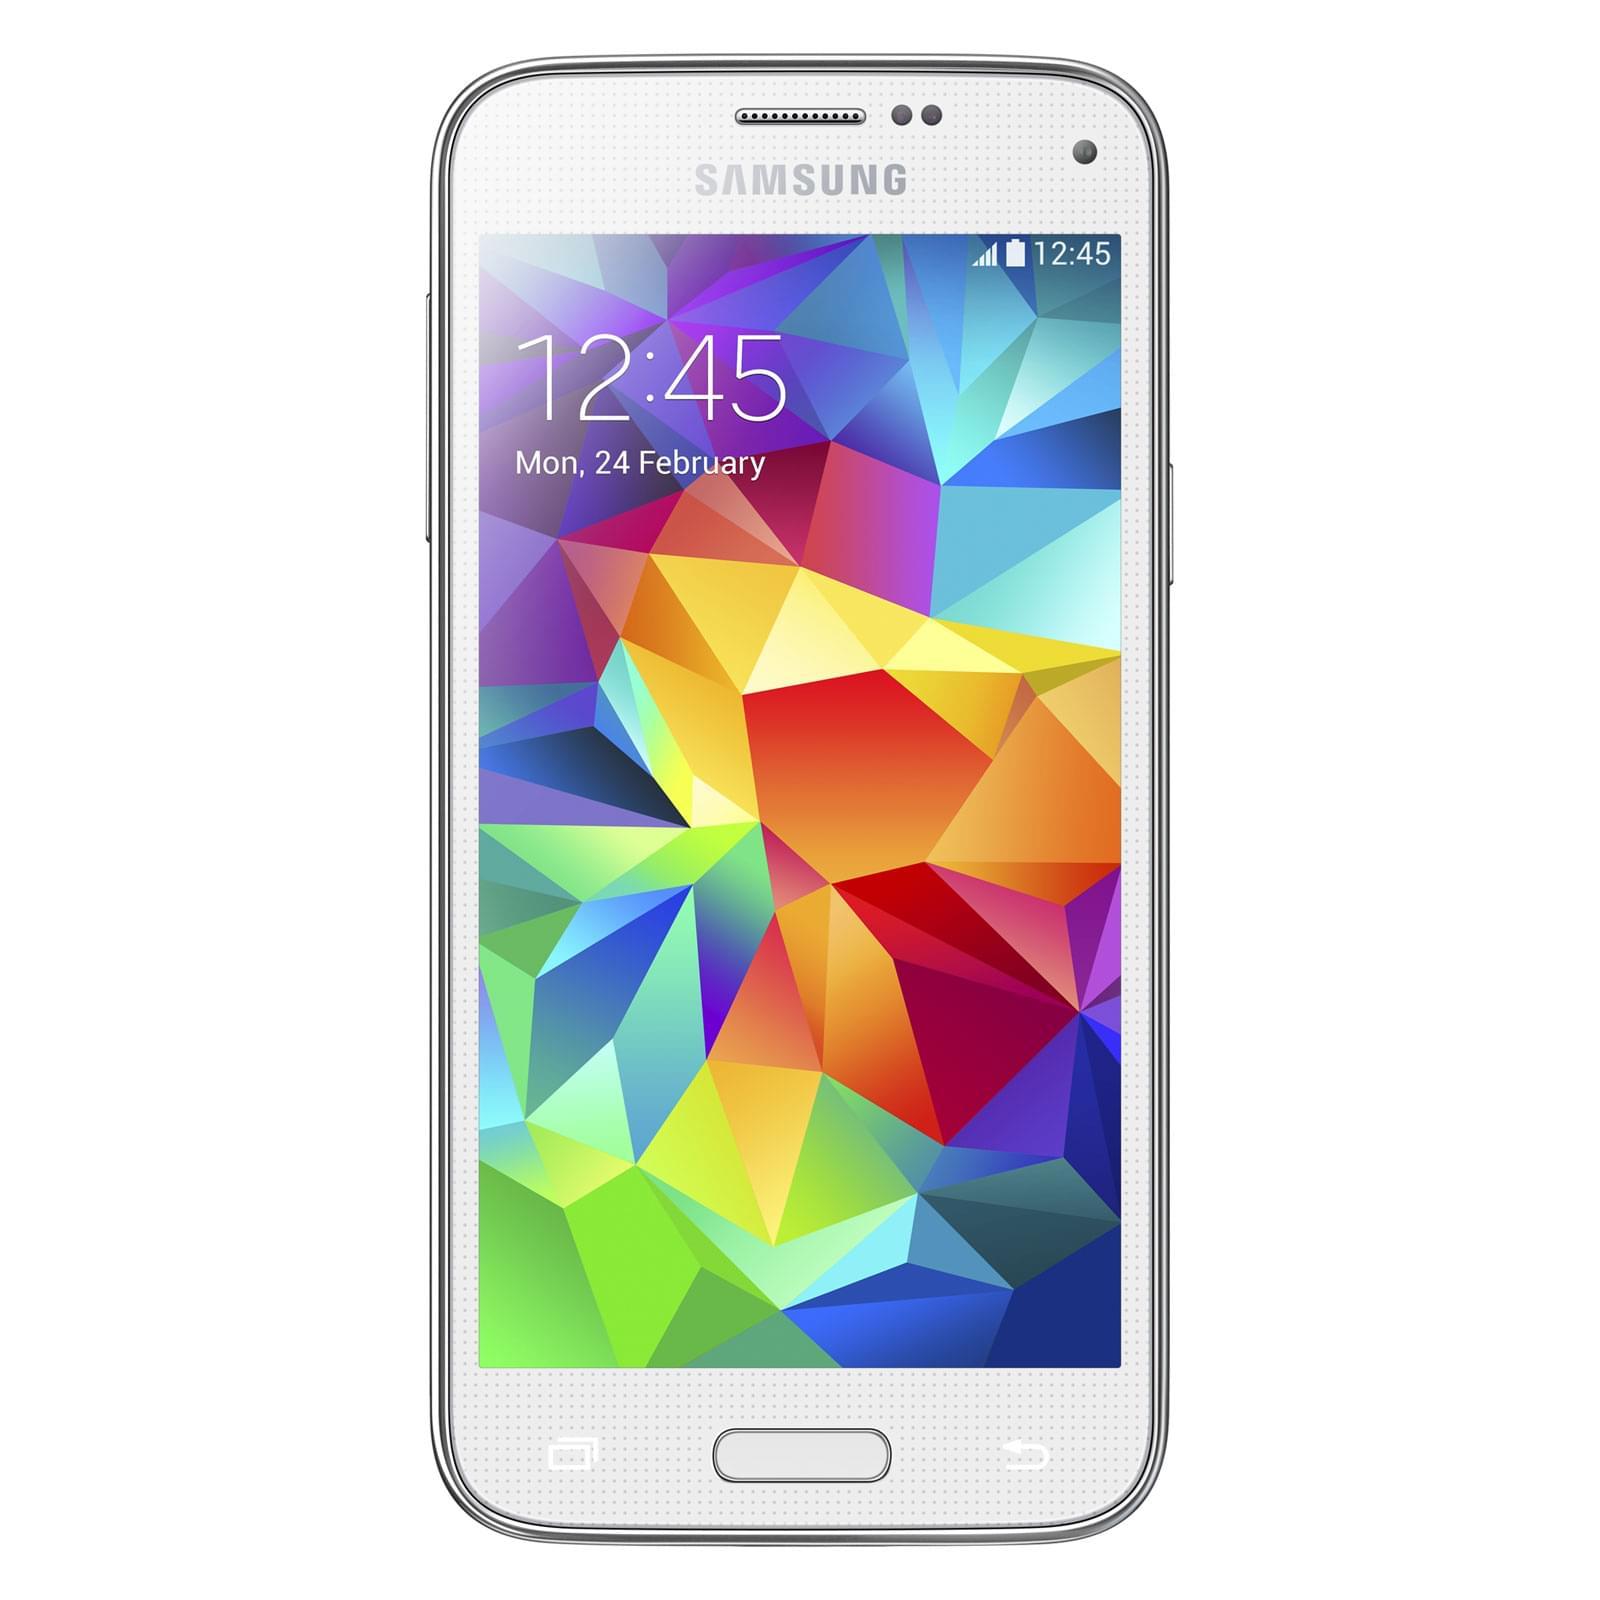 Samsung Galaxy S5 Mini G800 White (SM-G800FZWAXEF) - Achat / Vente Téléphonie sur Cybertek.fr - 0